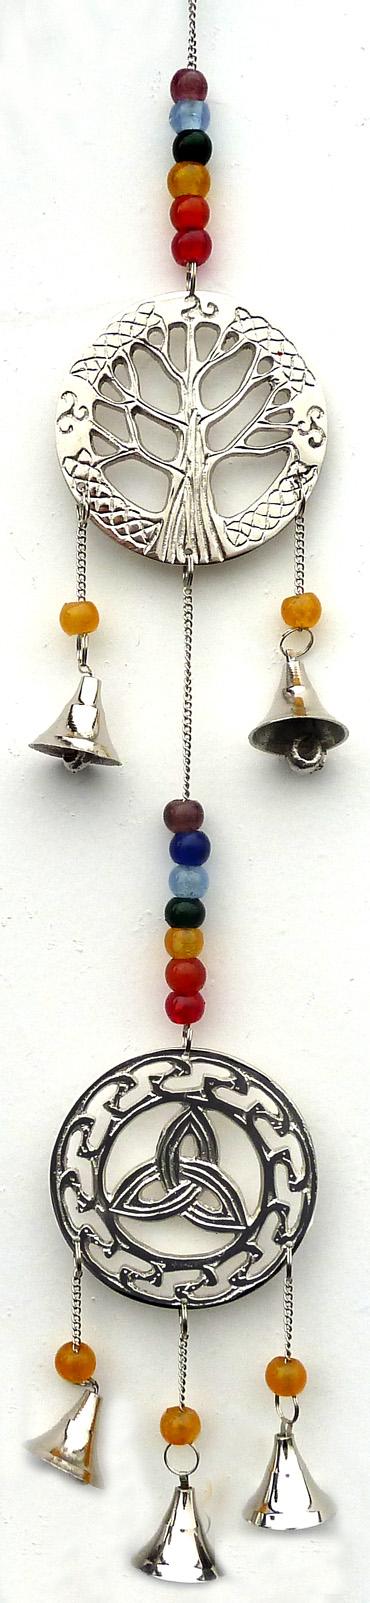 Carillon cuivre arbre de vie triskell cloche & perles 53cm